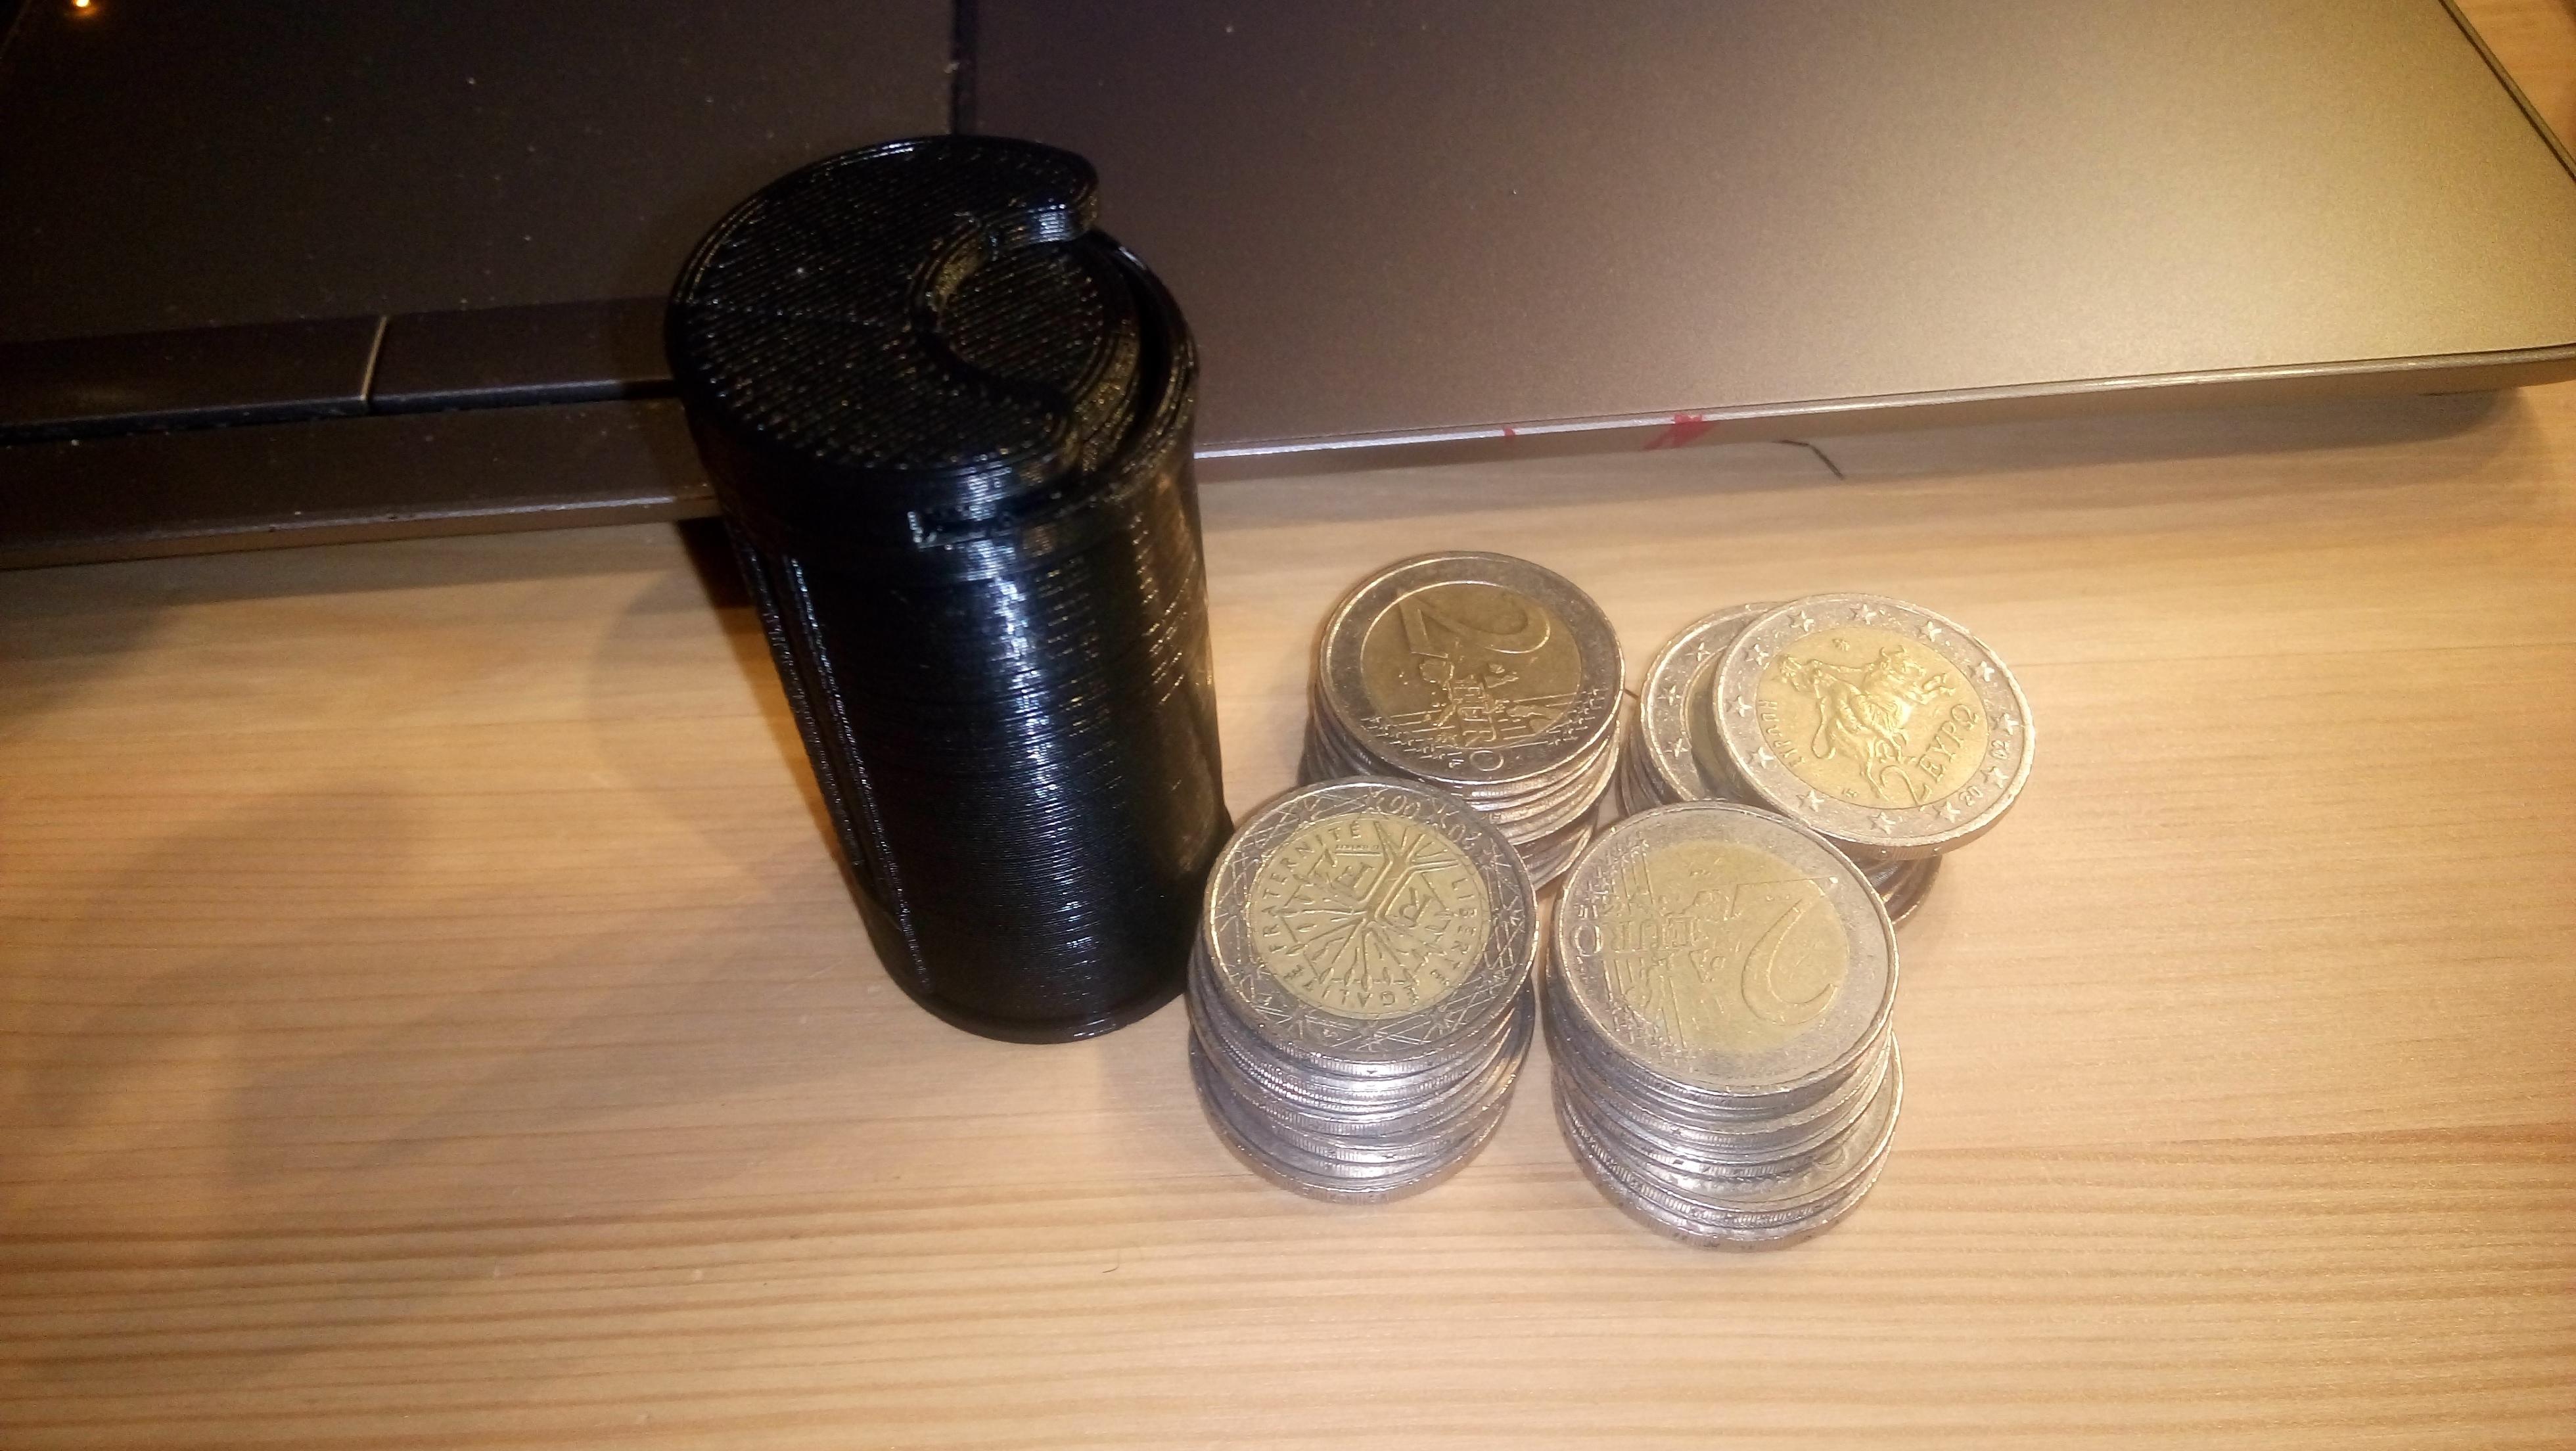 171025-DSC_2666.JPG Download free STL file 2 Euro Coin Magazine Dispenser • 3D print object, Milan_Gajic